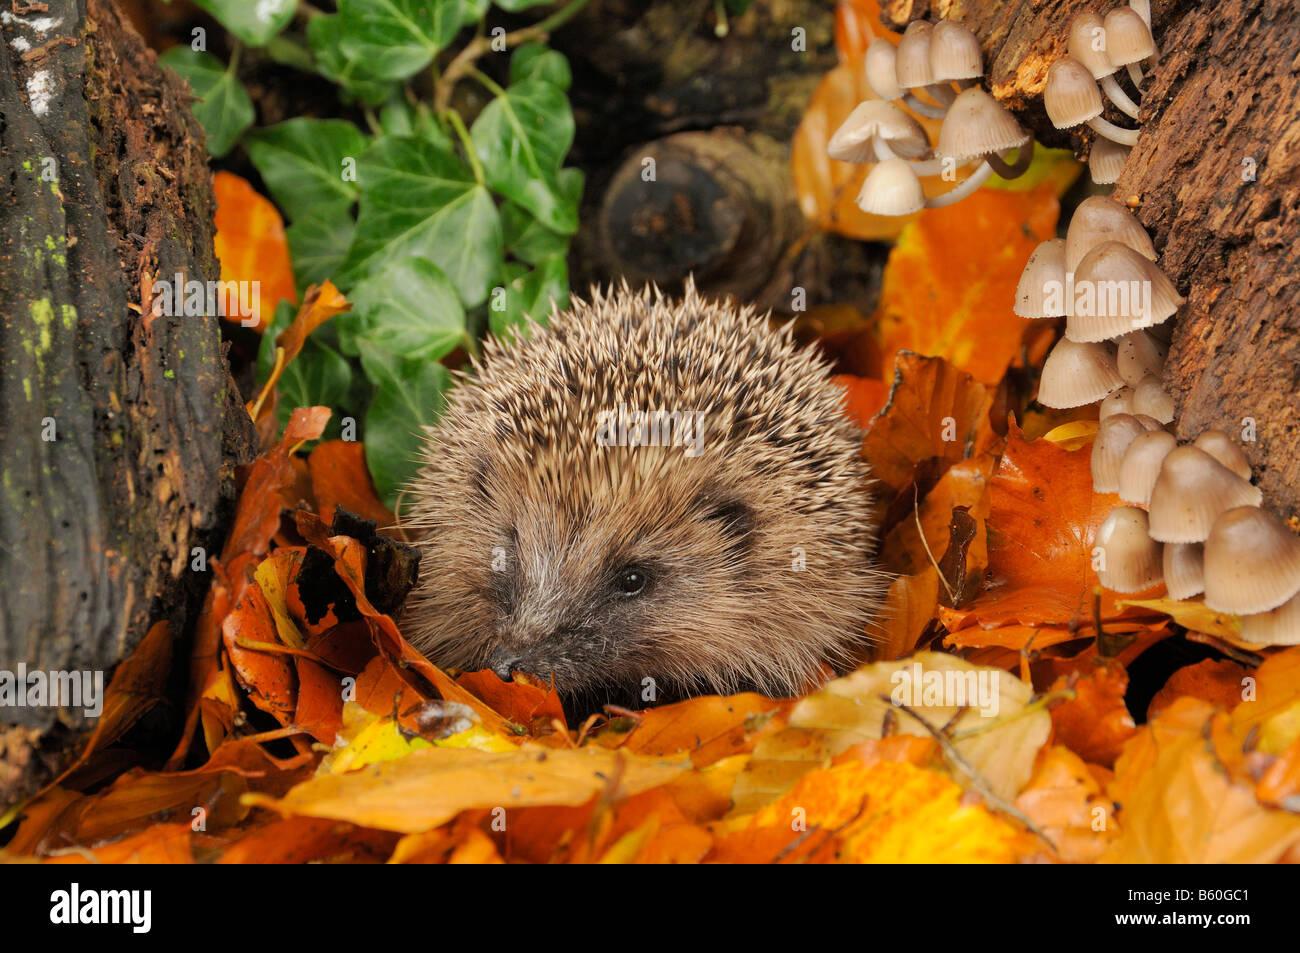 Hedgehog erinaceus europaeus foraging for food in autumn woodland setting UK - Stock Image